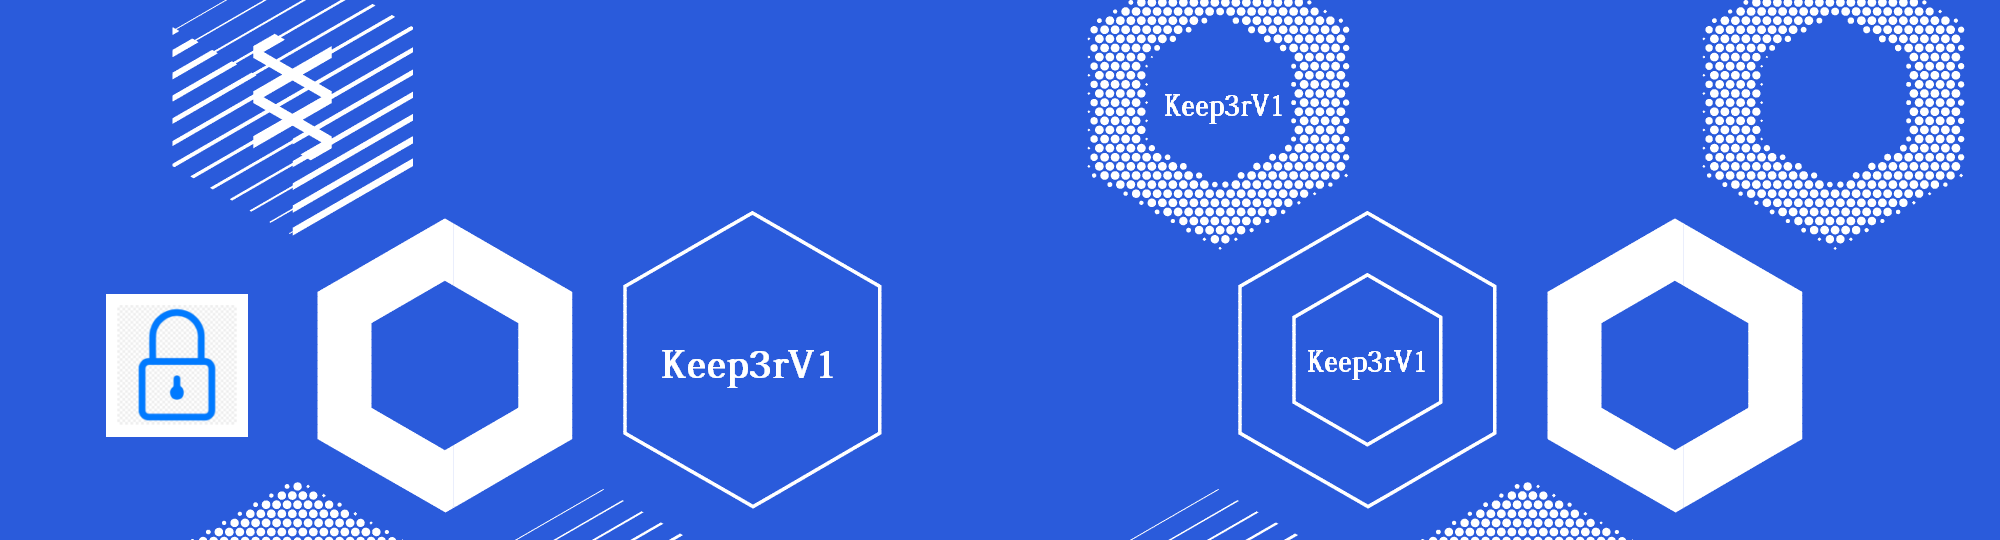 Keep3rV1